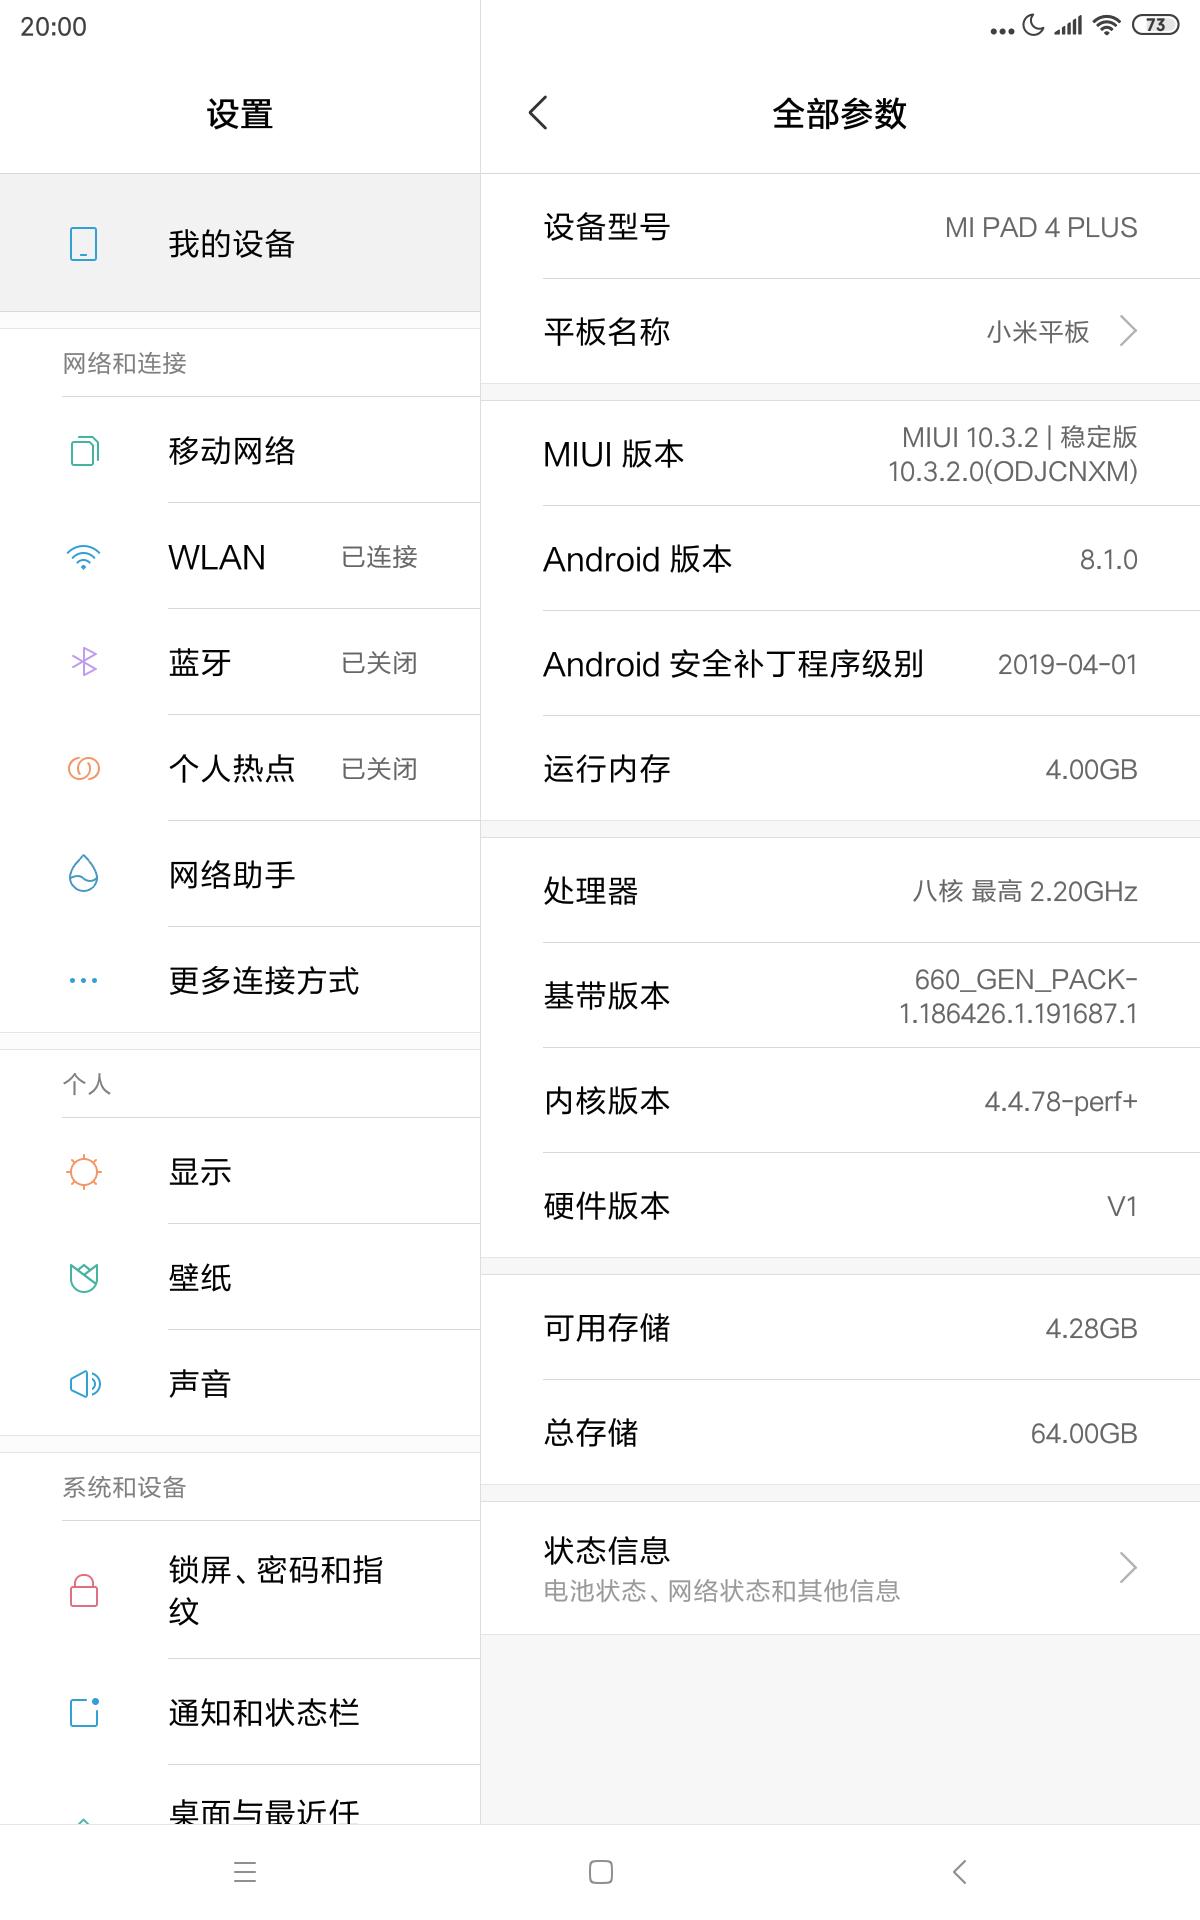 Screenshot_2019-08-12-20-00-06-833_com.android.se.png